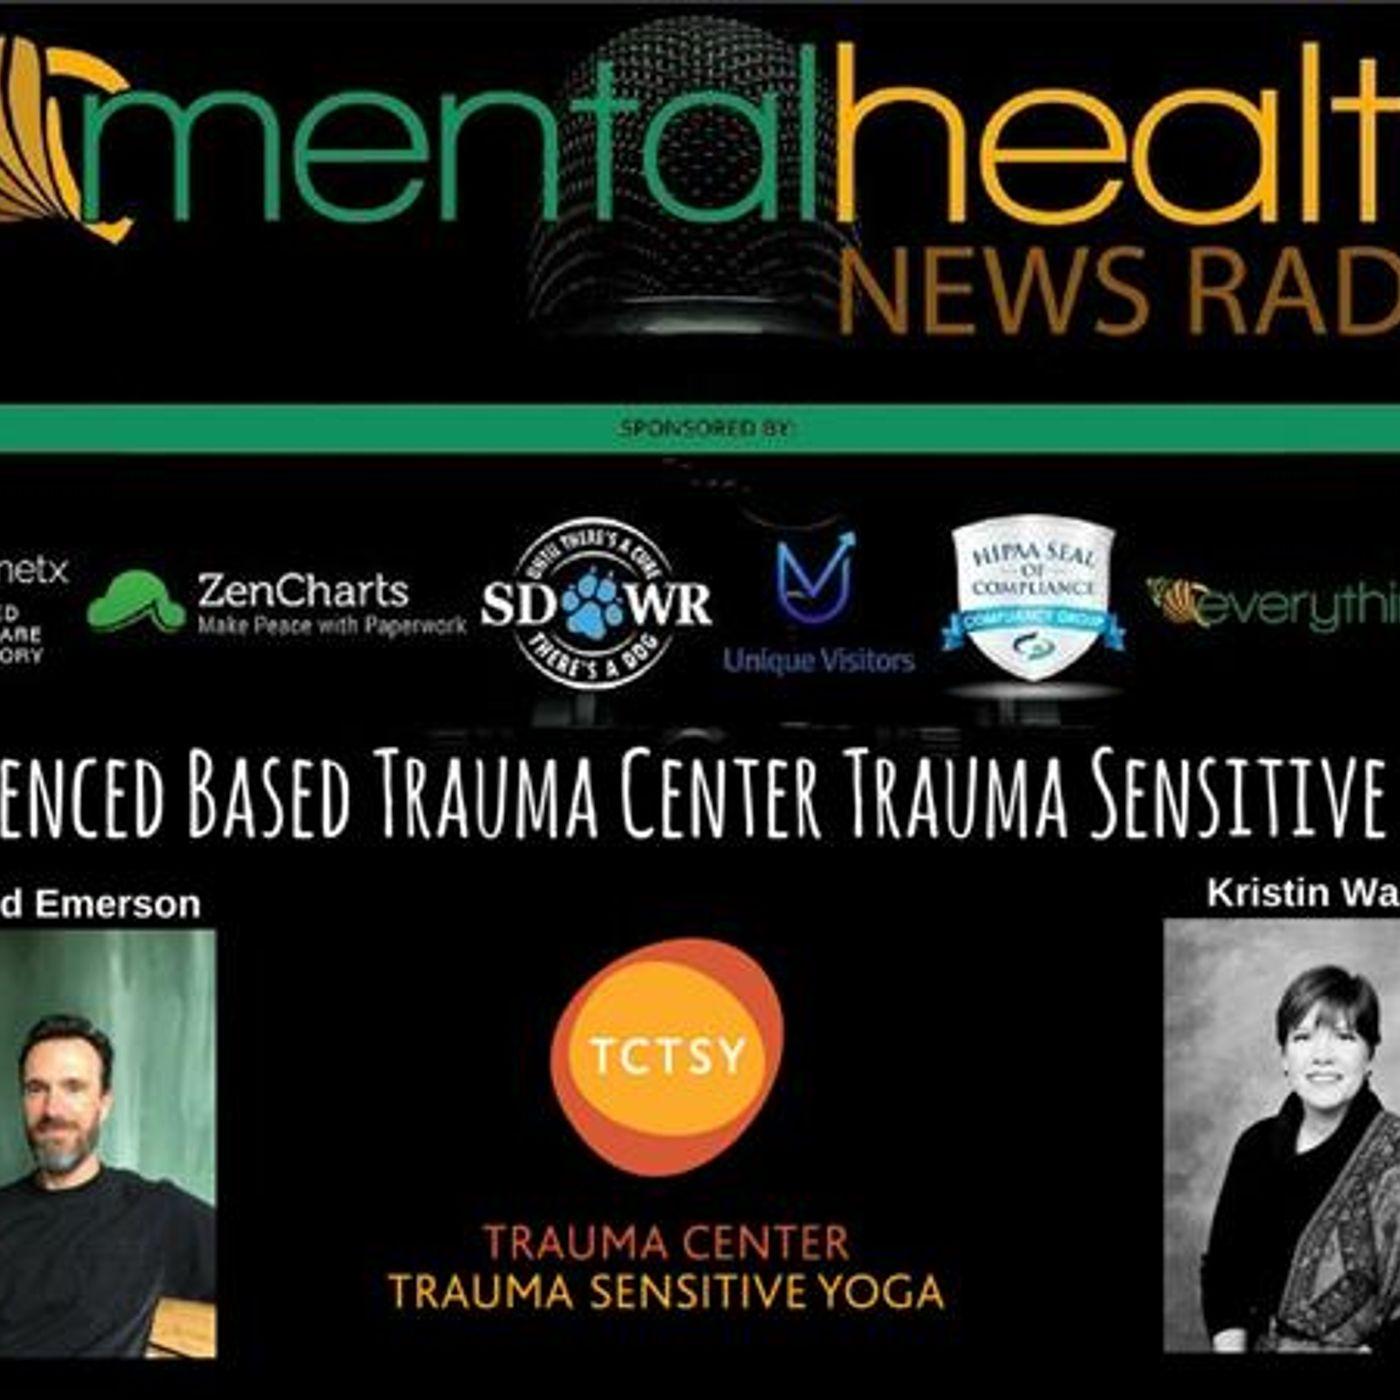 Mental Health News Radio - Evidenced Based Trauma Center Trauma Sensitive Yoga with Director David Emerson